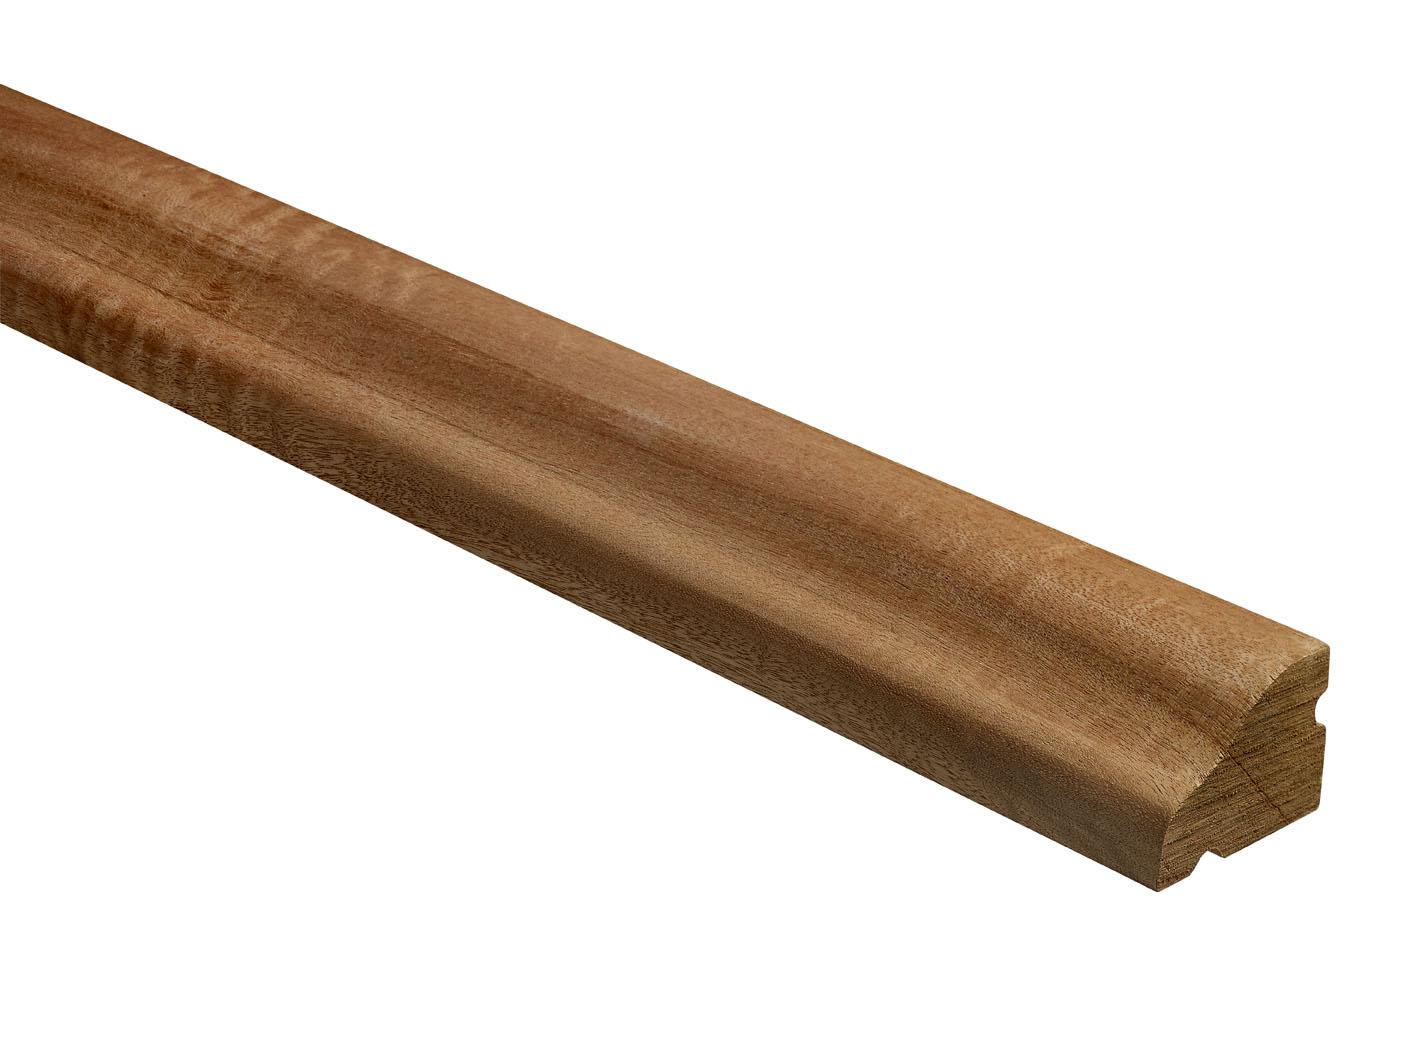 10 Dark Hardwood Weather Bar Mouldings 43 x 57 x 900mm